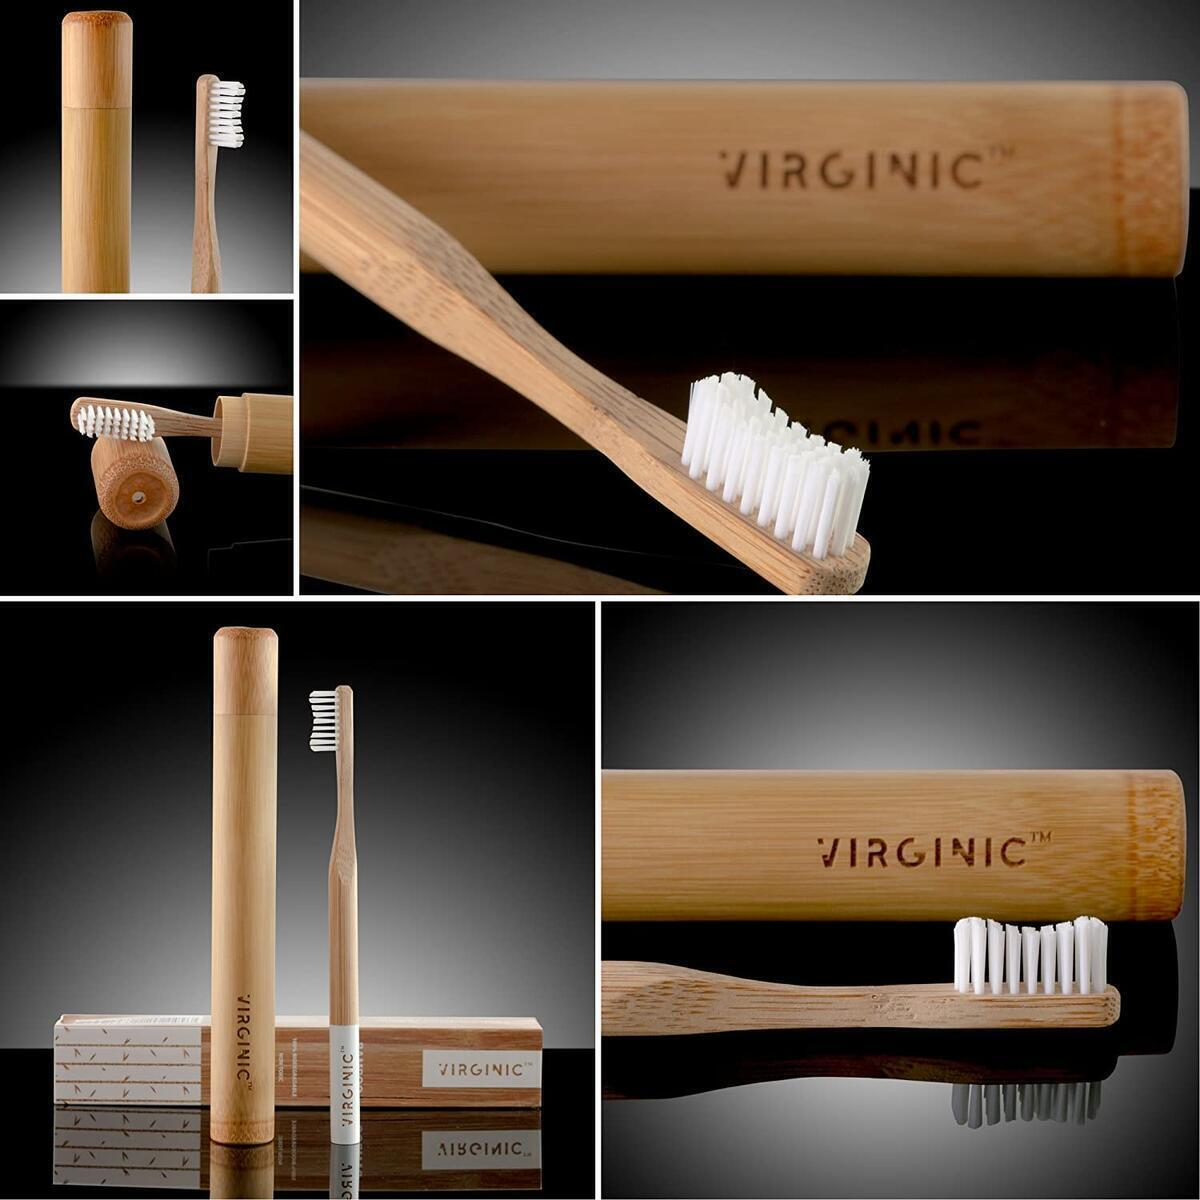 TUGARI (V Edition, 2020) Organic Bamboo Toothbrush with Elegant Eco Travel Case